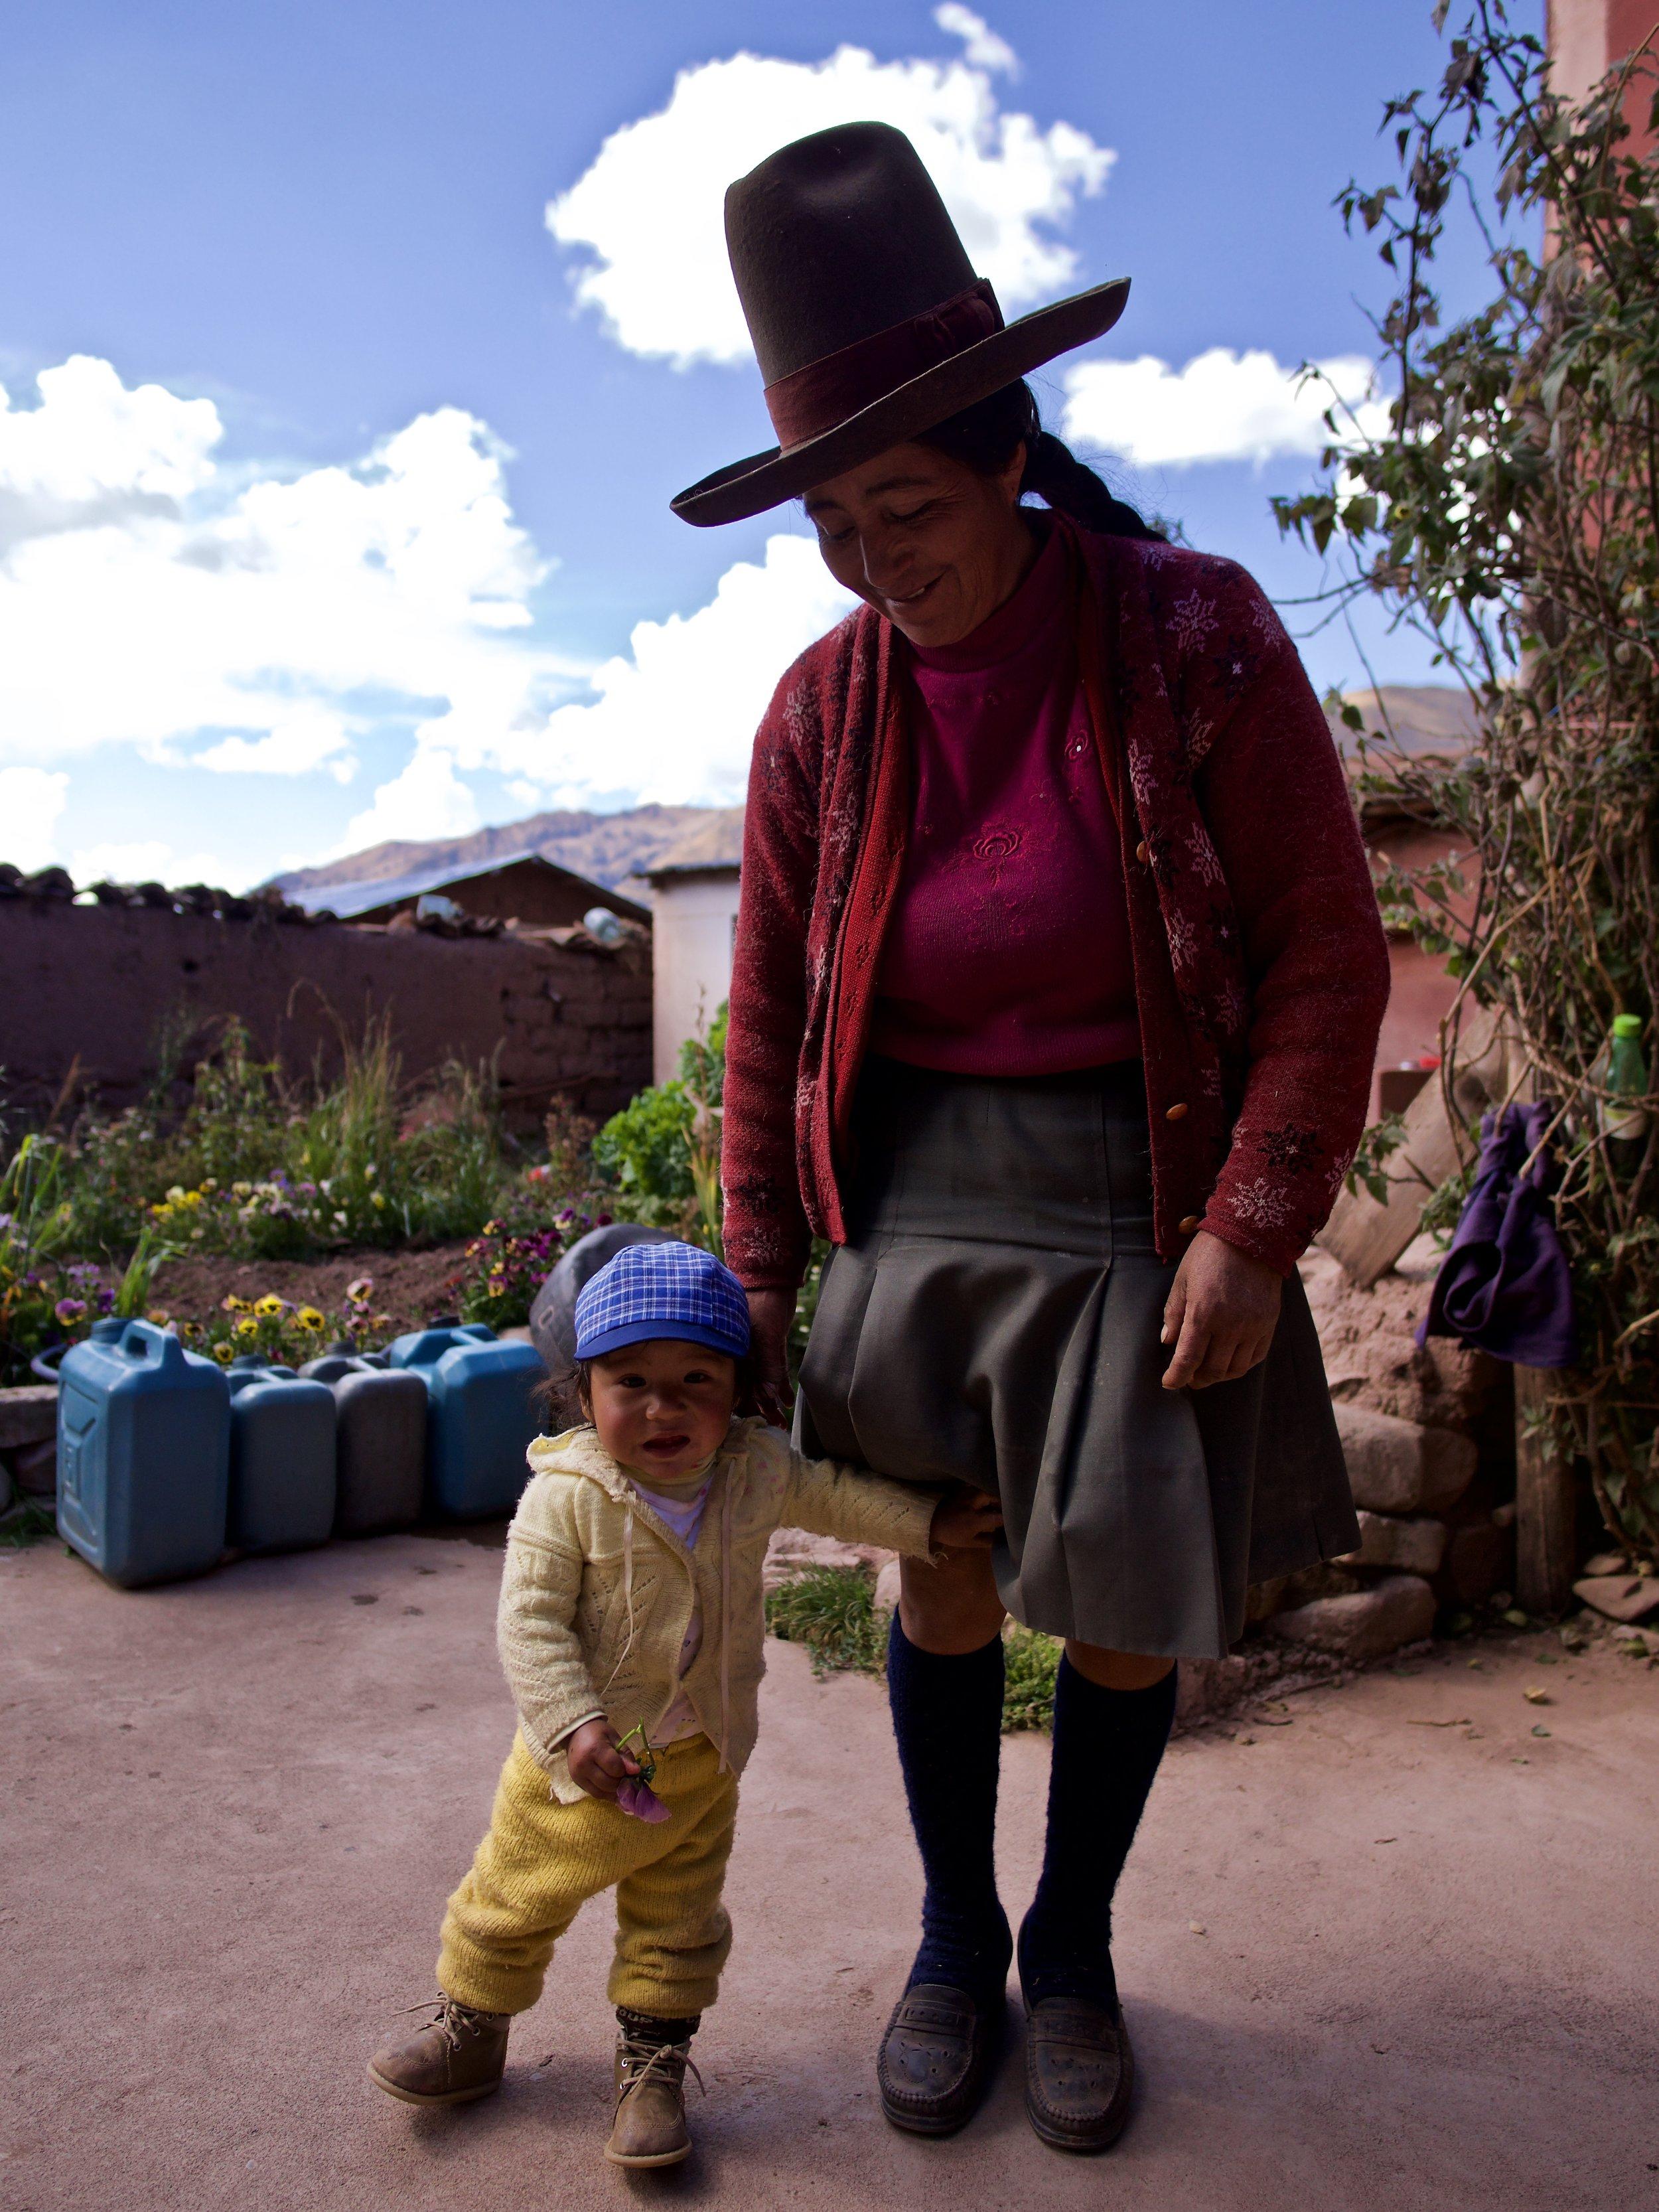 Rafaela Sallo - Volunteer Host, IVHQ PeruCrossing cultures in the Andean Mountains.